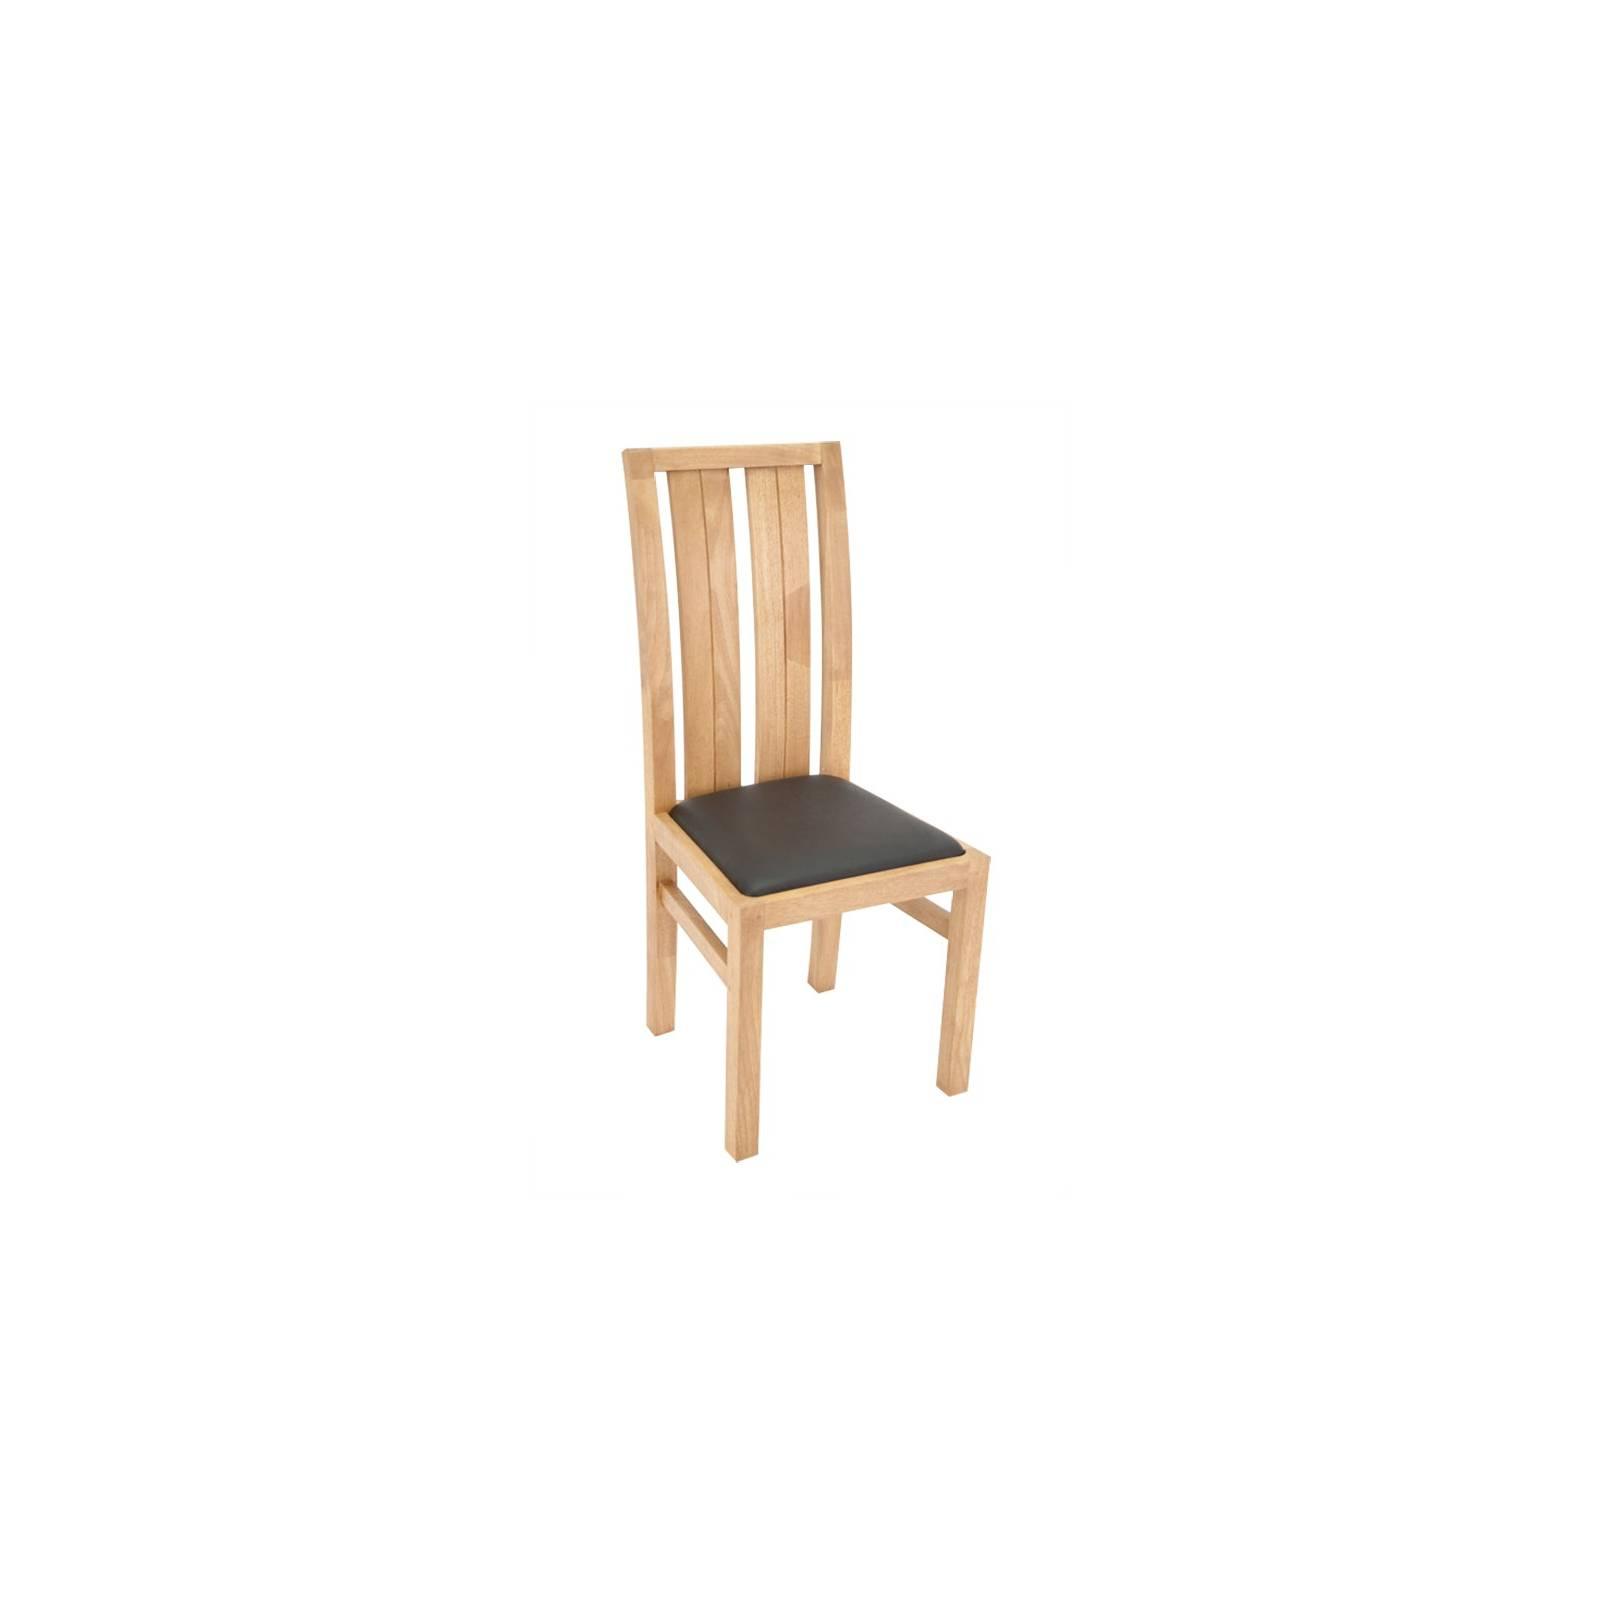 Chaise Broadway Hévéa - meuble bois massif